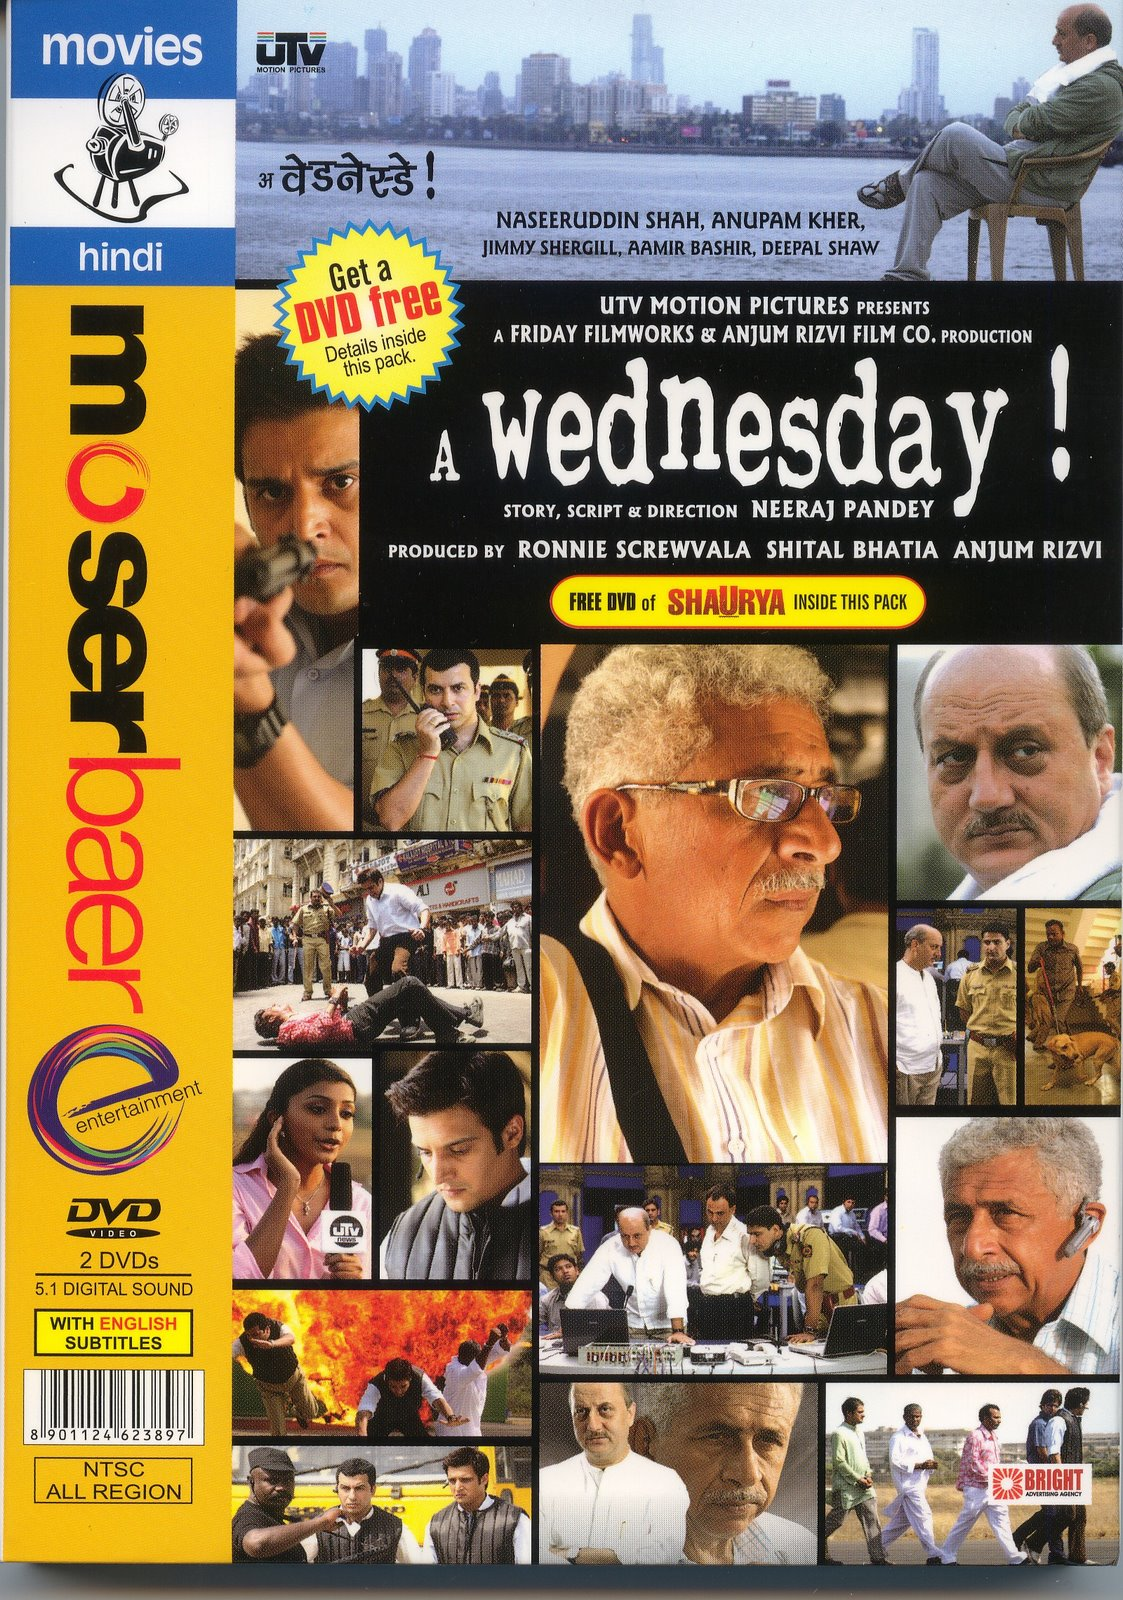 Unnai-pol-Oruvan-Kamal-Hassan-A-wednesday-UPO-Hindi-films-banners